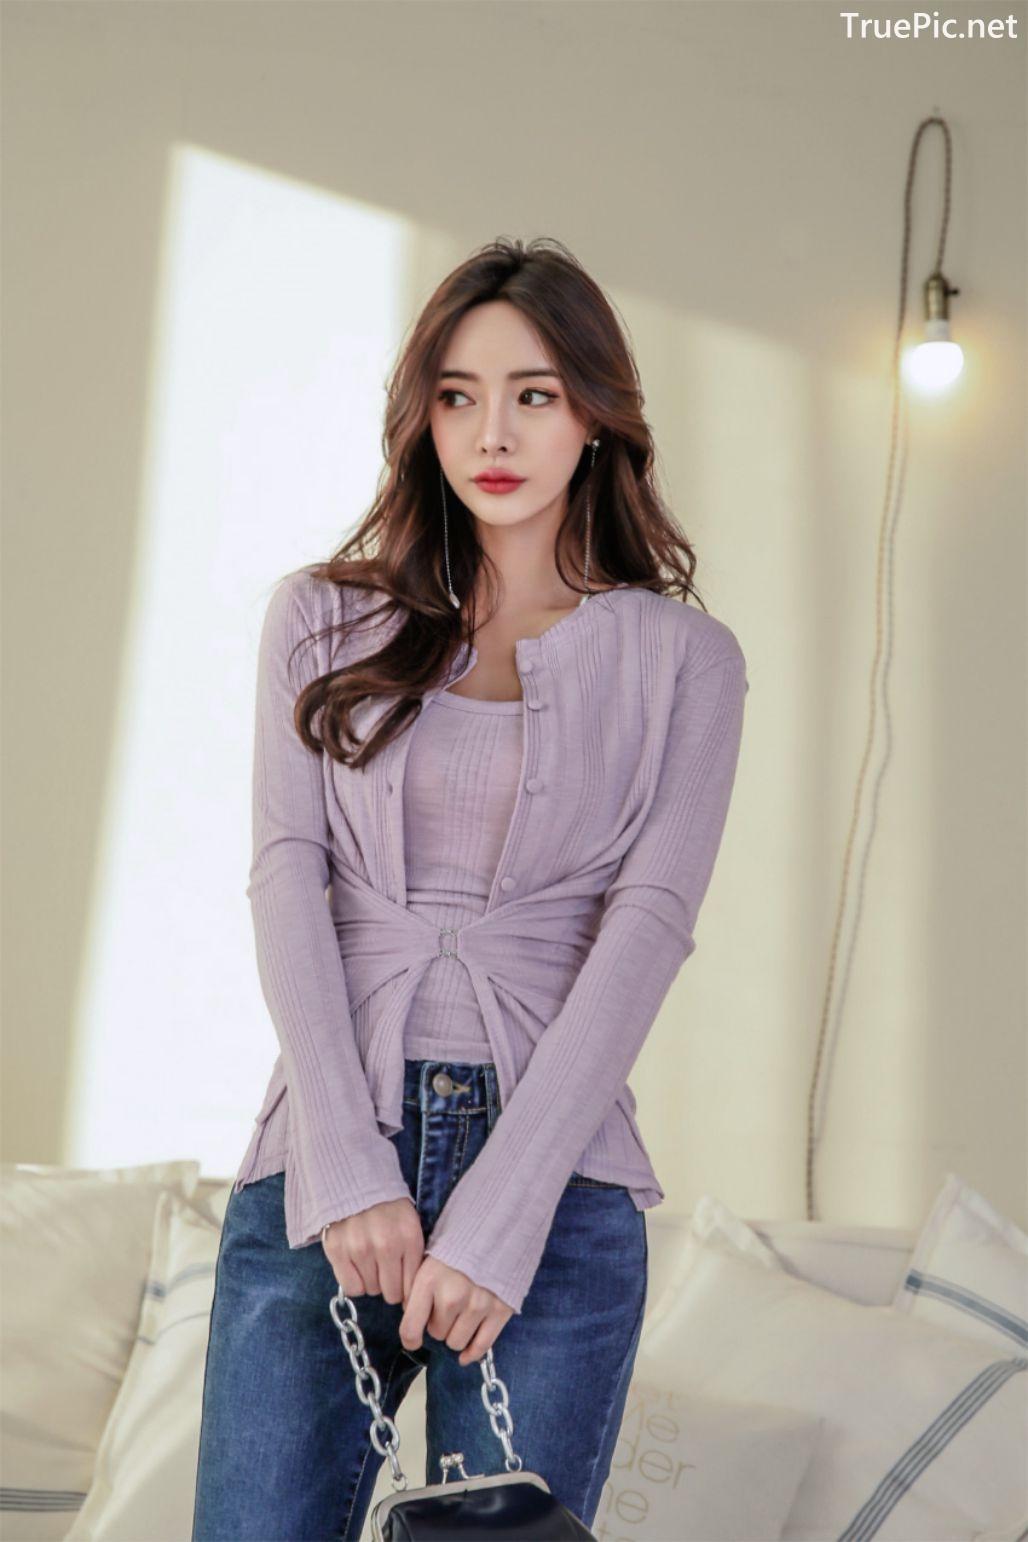 Image-Korean-Fashion-Model-Kim-Bo-Ram-Jeans-Set-Collection-TruePic.net- Picture-5